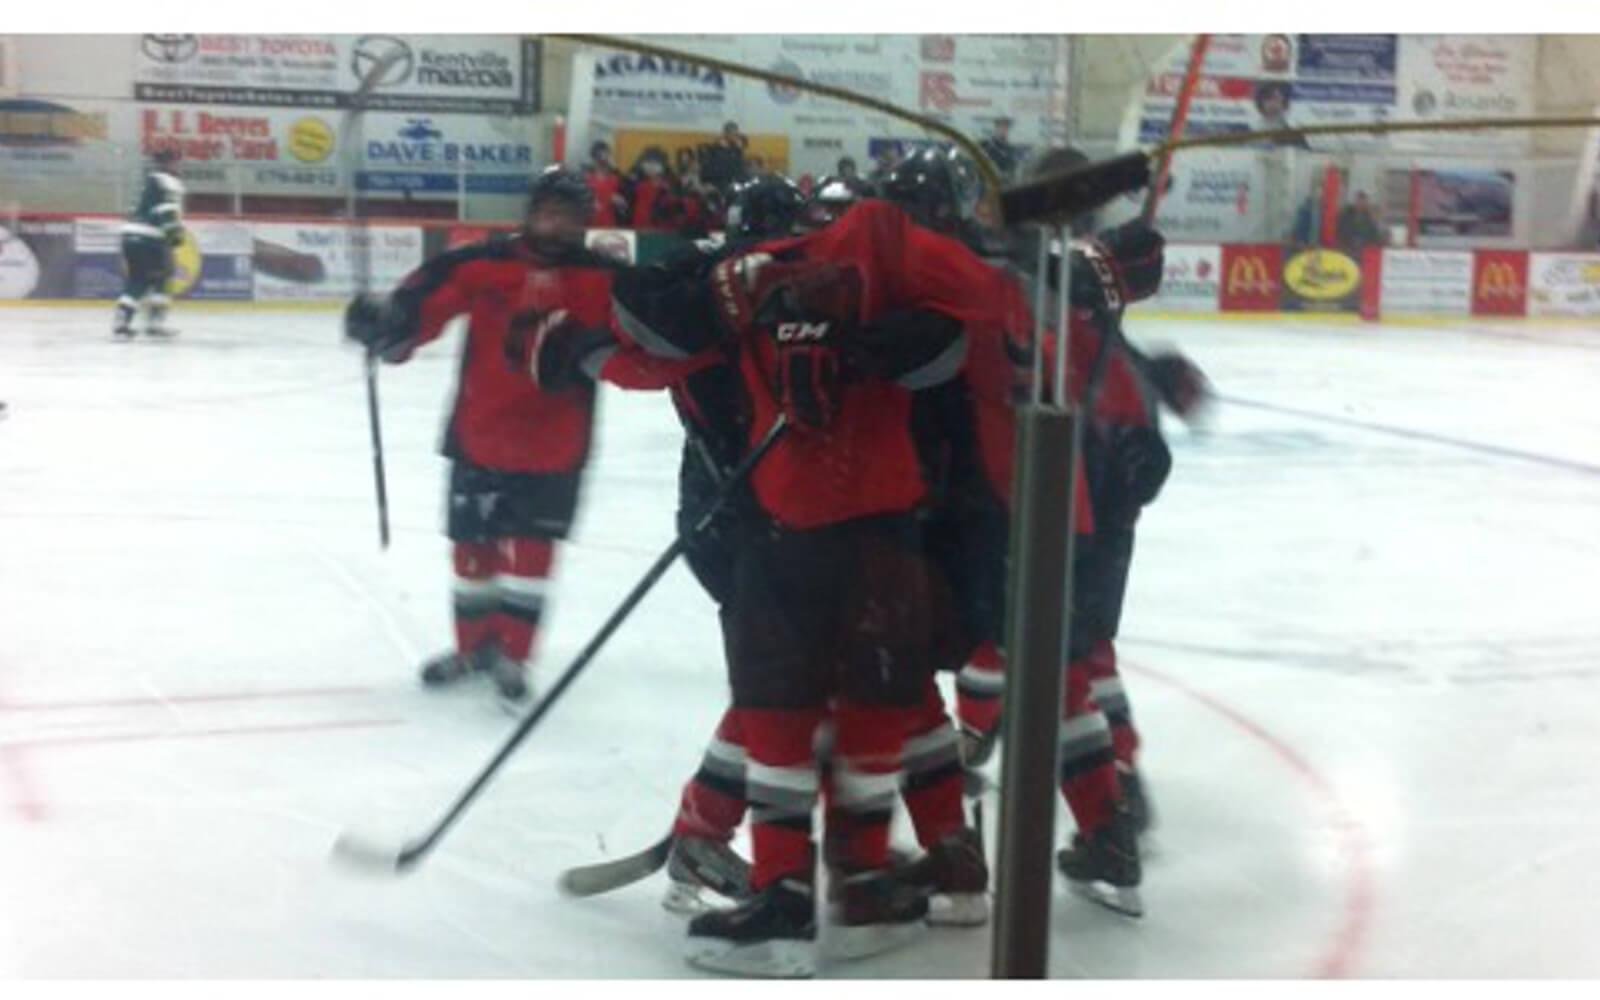 Eishockeyteam auf dem Feld